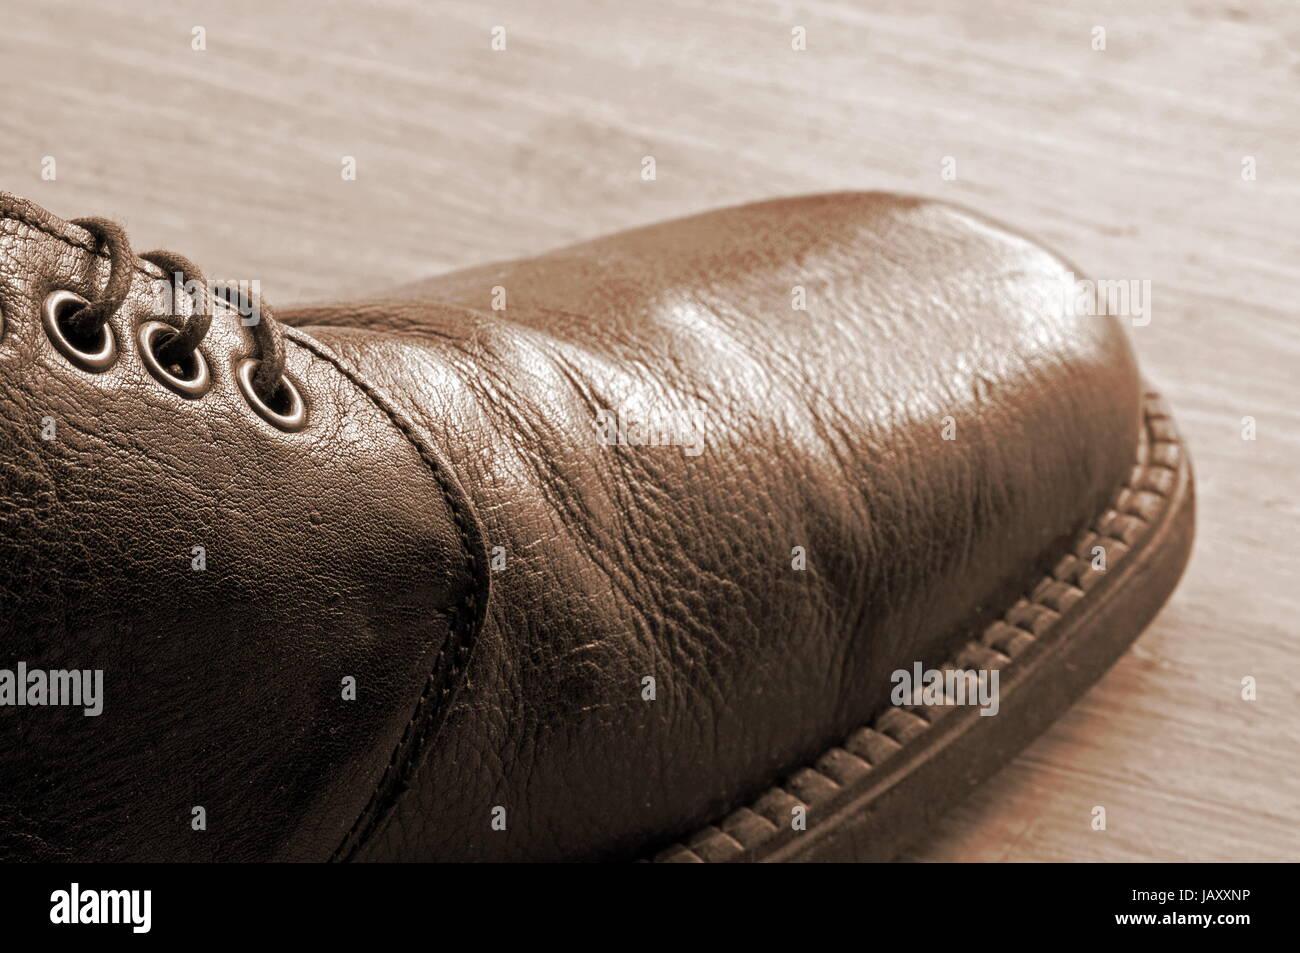 leather shoe antique-style Stock Photo